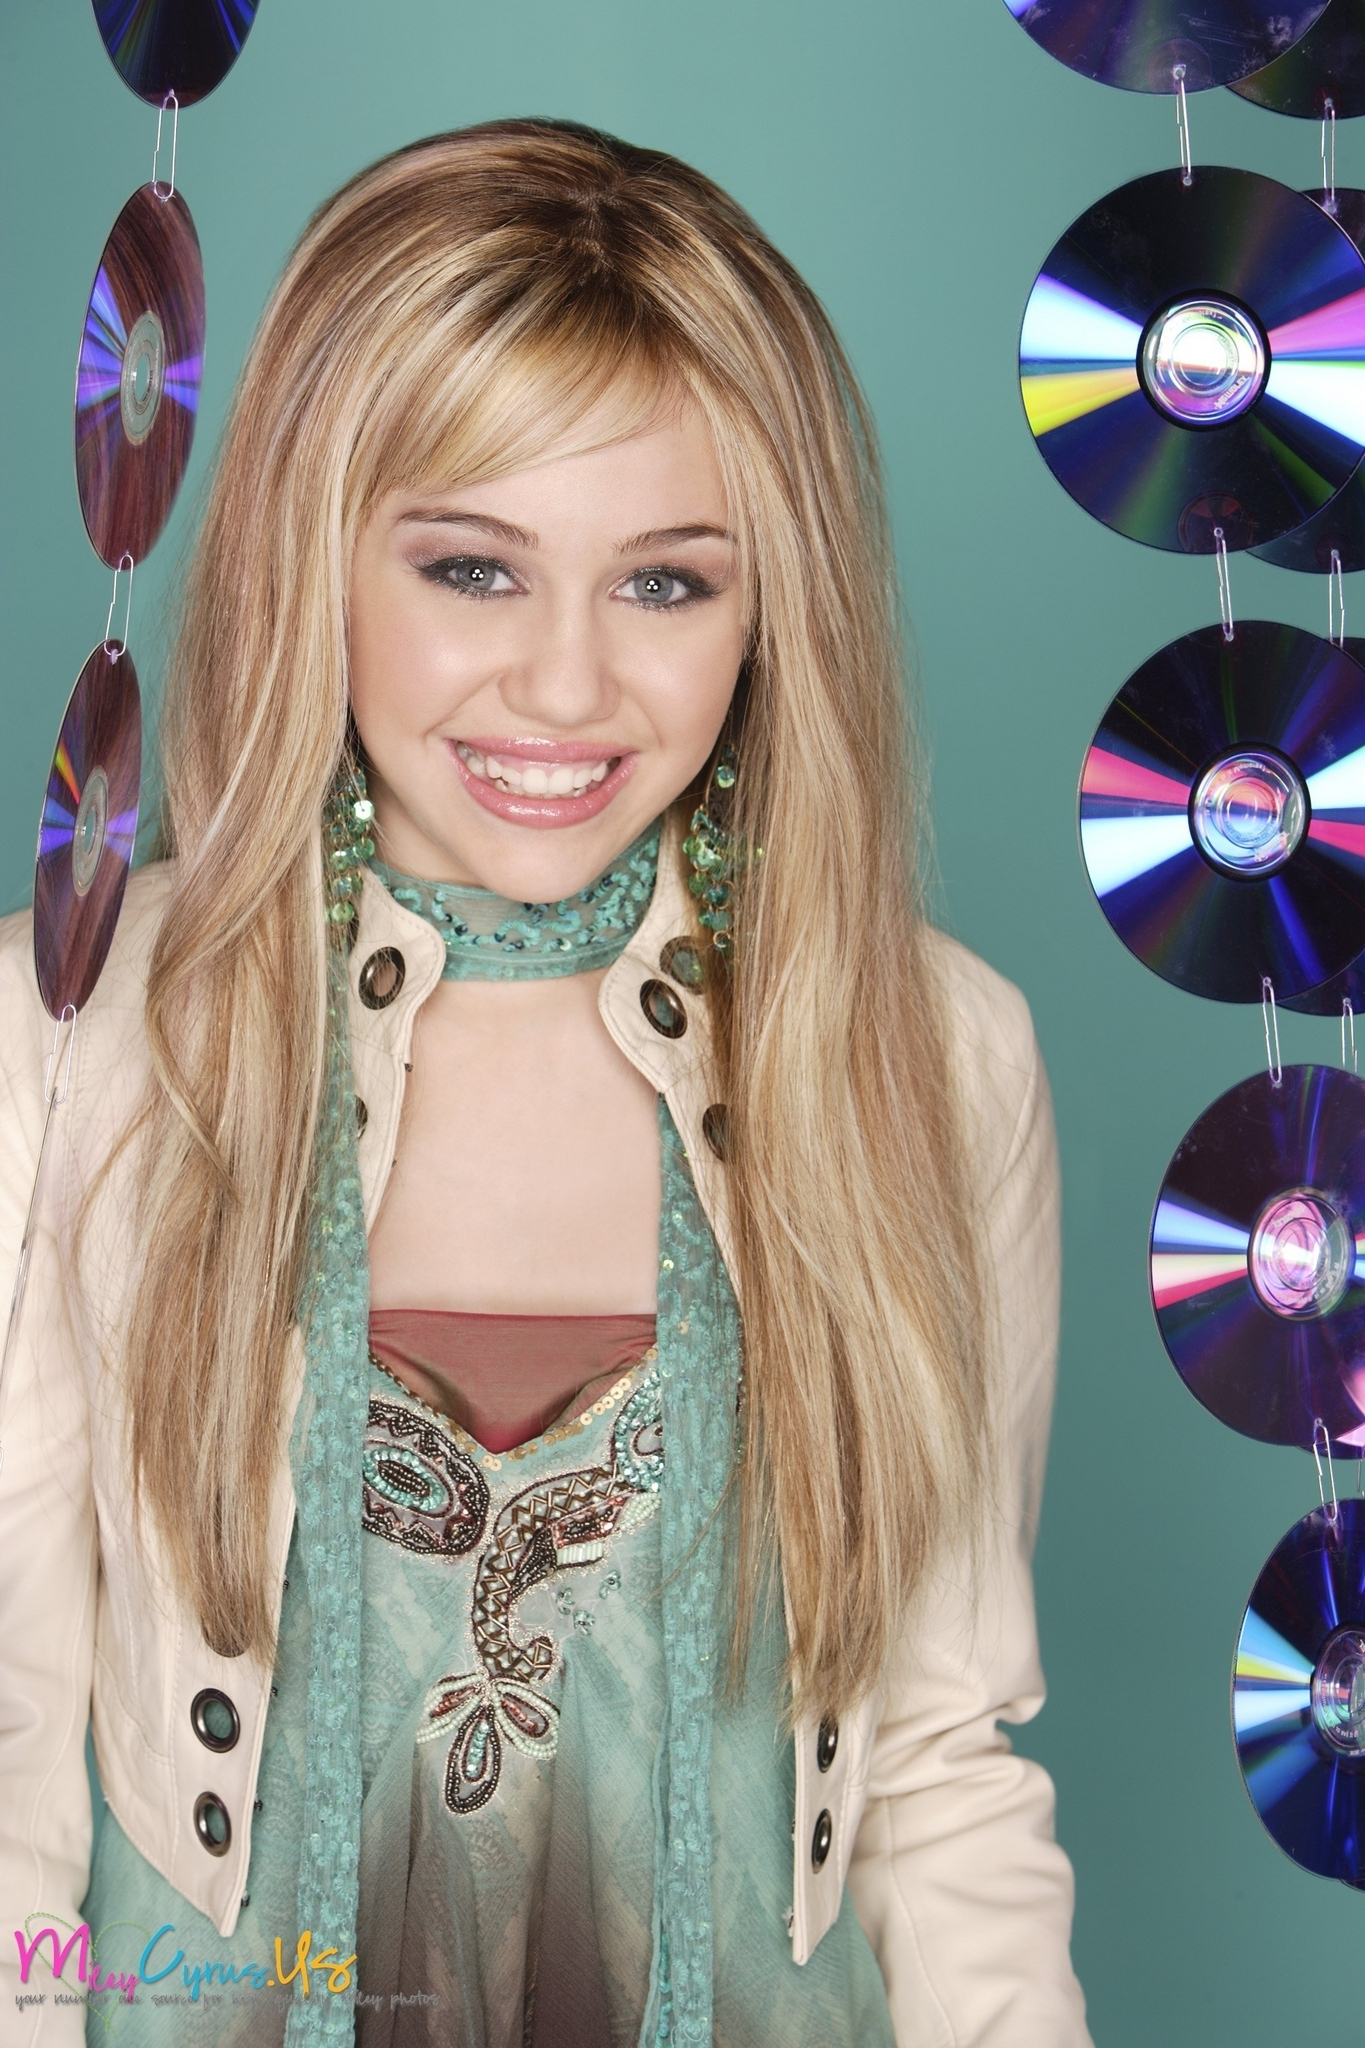 Hannah Montana images Hannah Montana Season 1 Promotional Photos [HQ]